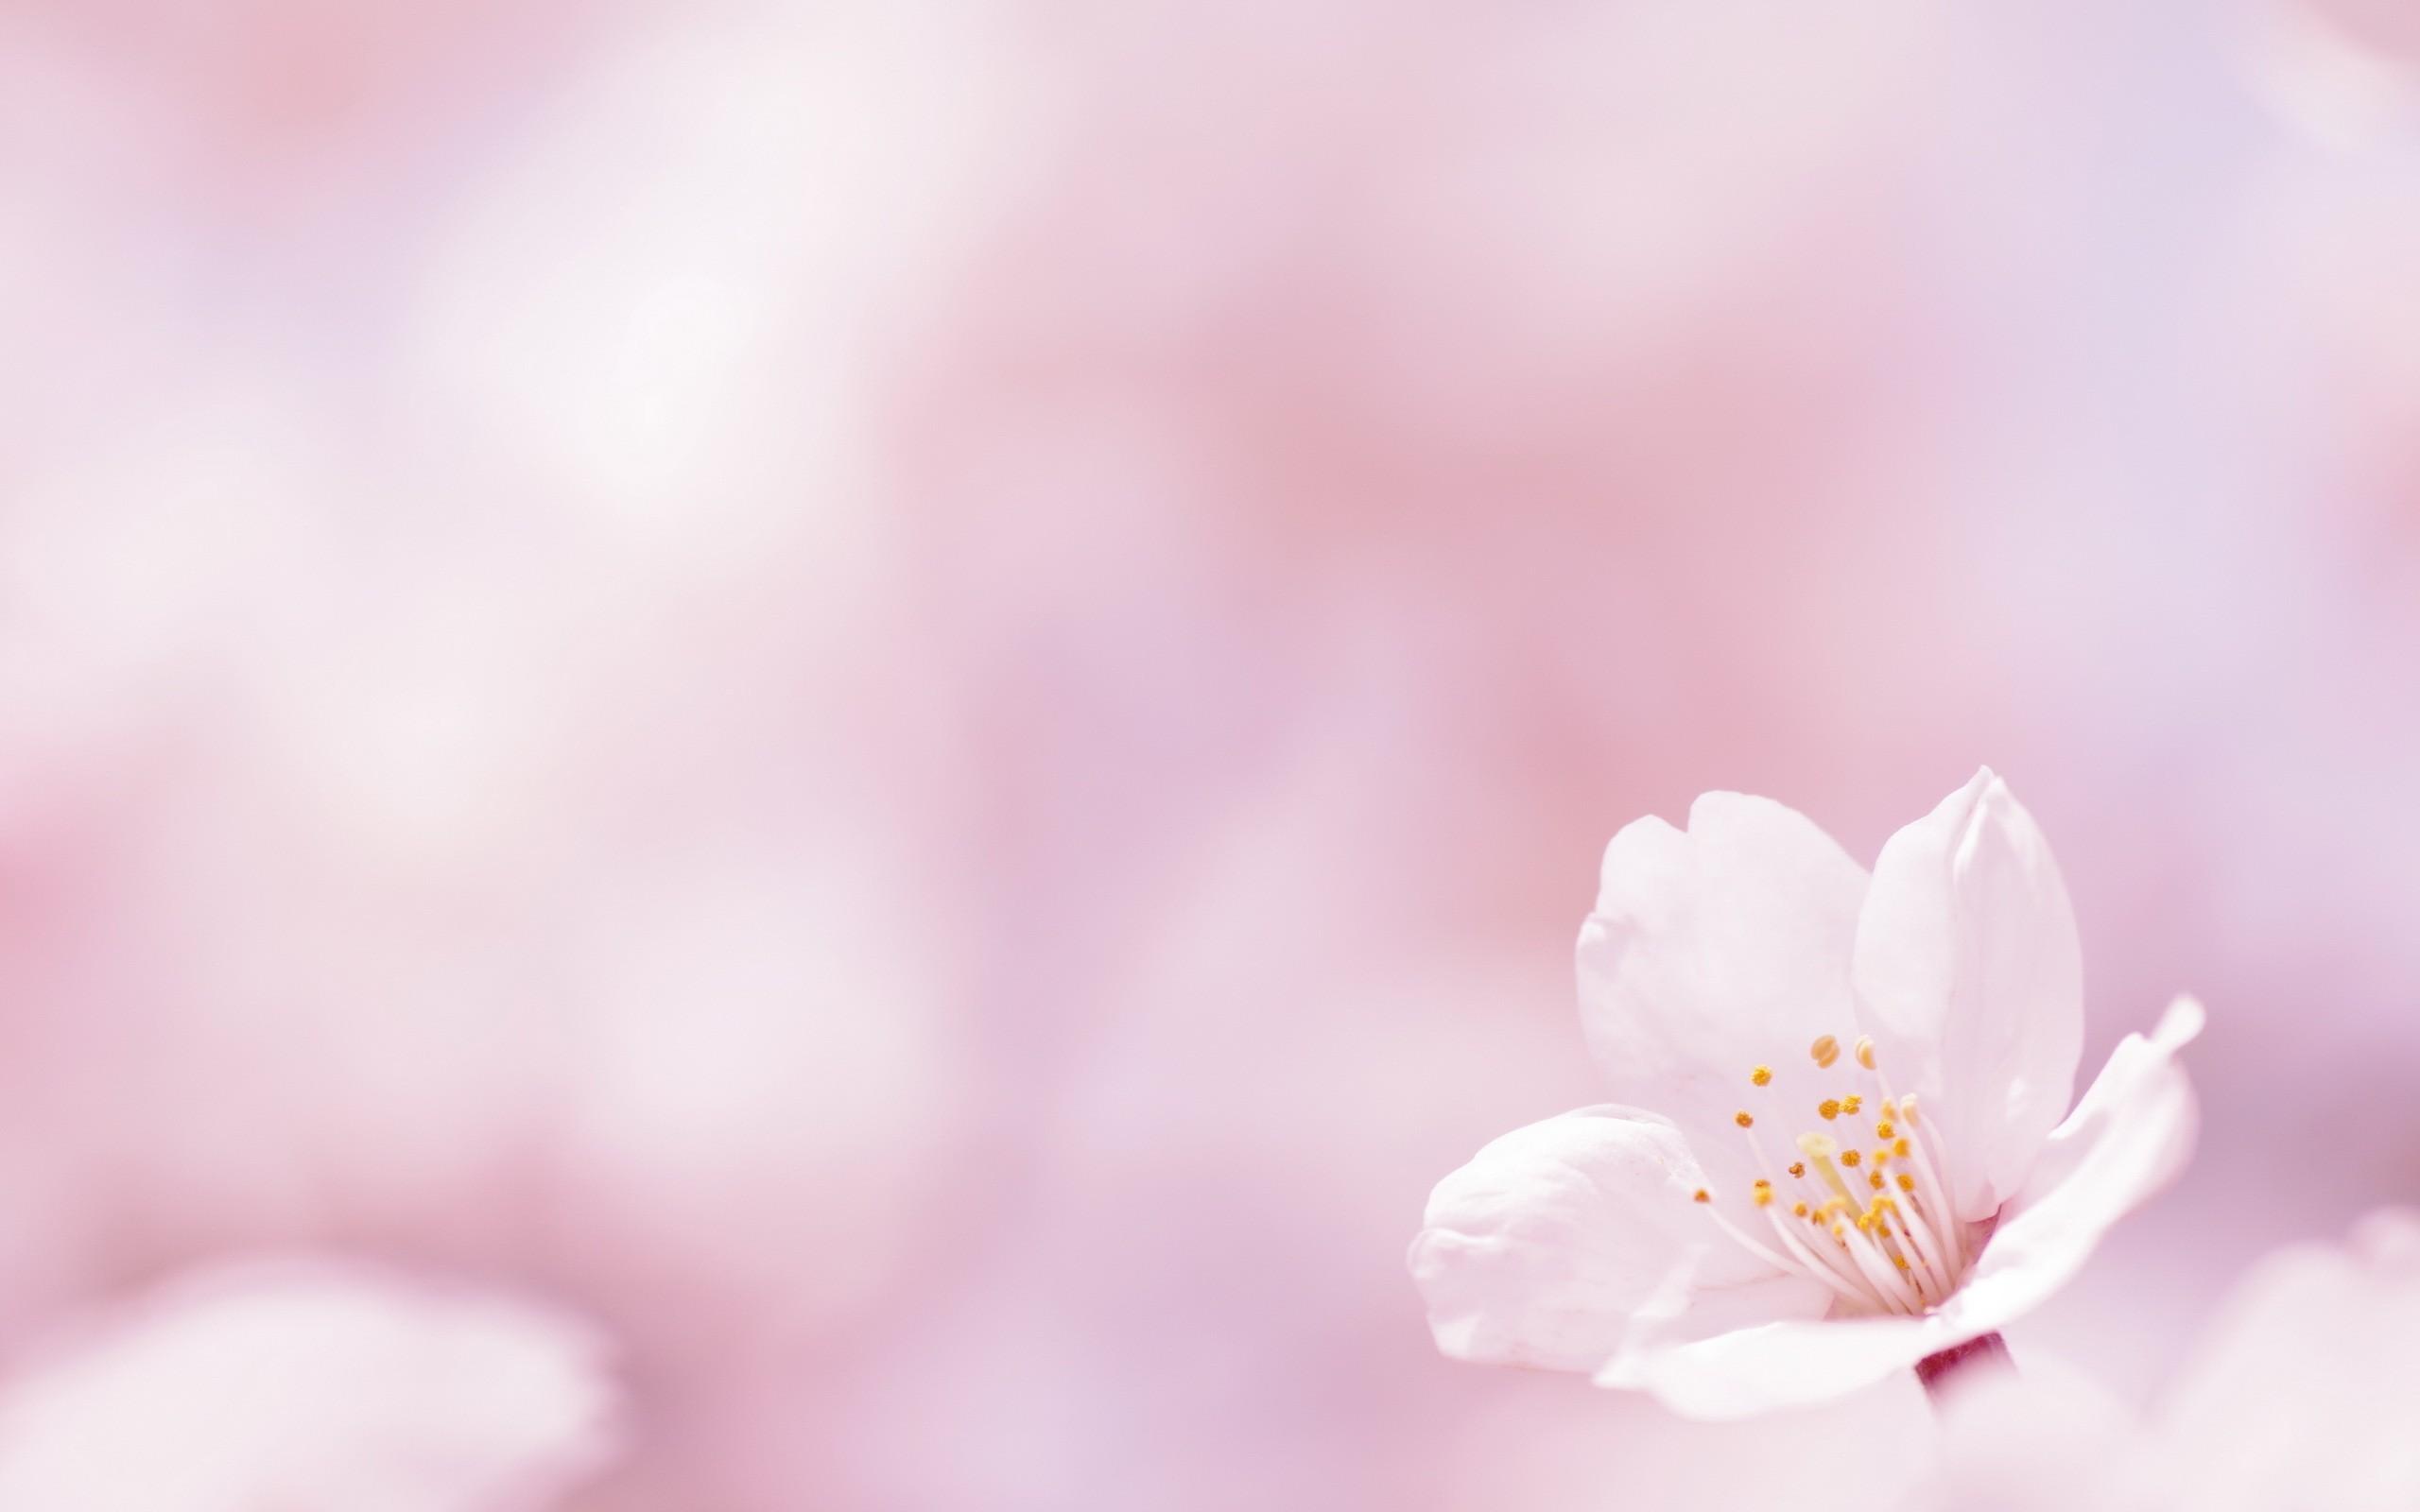 Flower Background WallpaperSafari